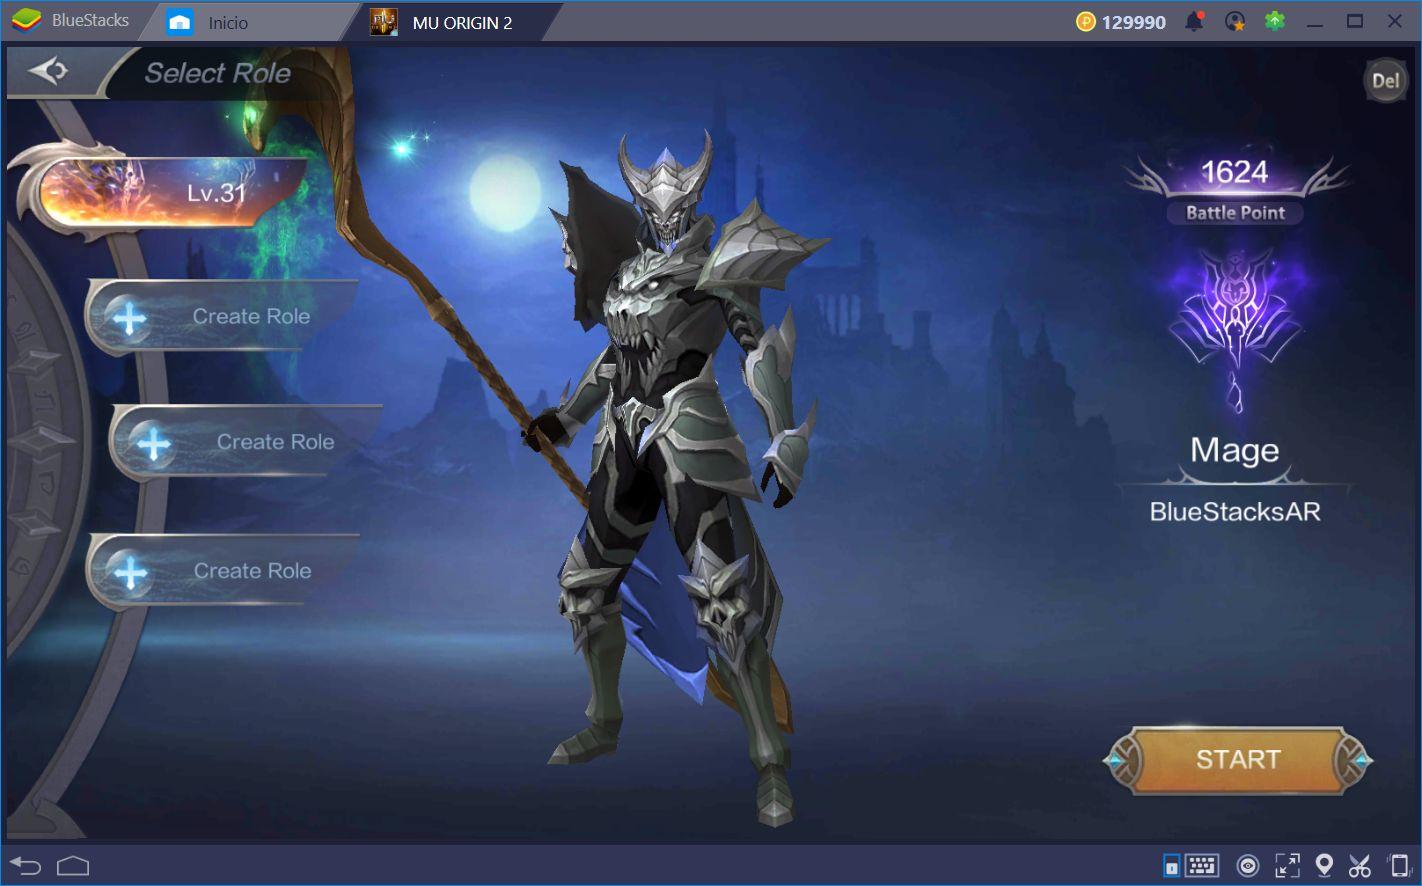 MU Origin 2—El Famoso MMORPG Recibe un Nuevo Look